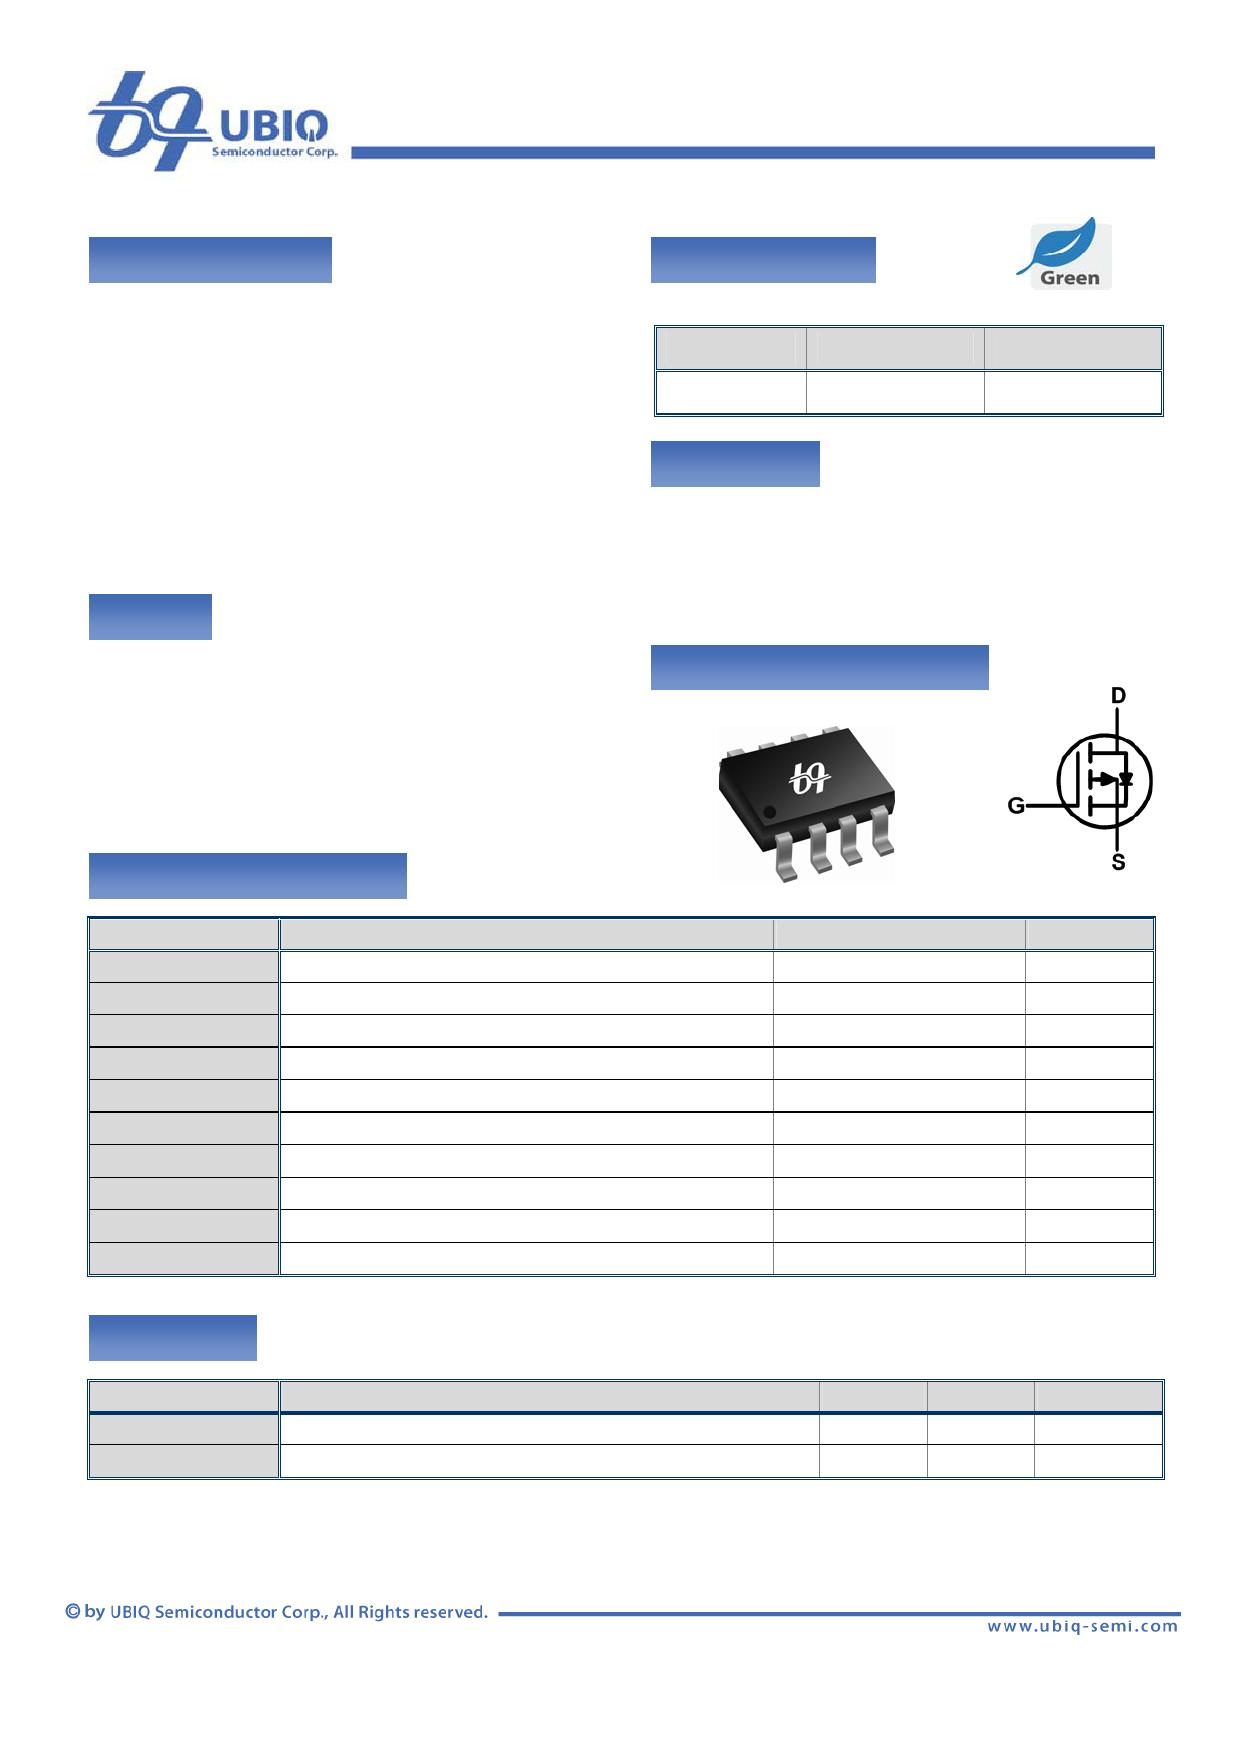 QM3007S 데이터시트 및 QM3007S PDF